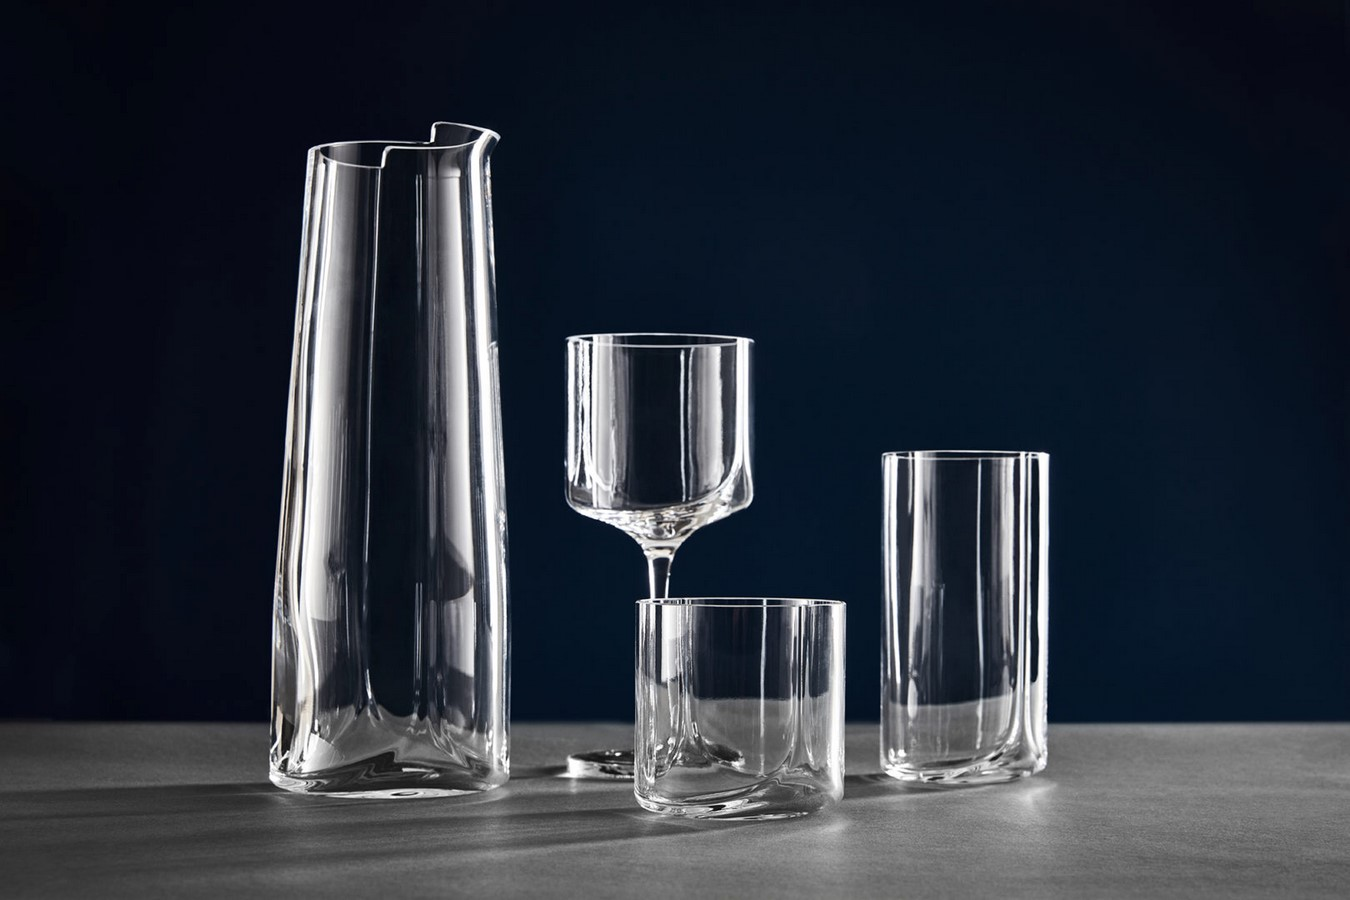 HEW TRAY & GLASSWARE - Sheet2